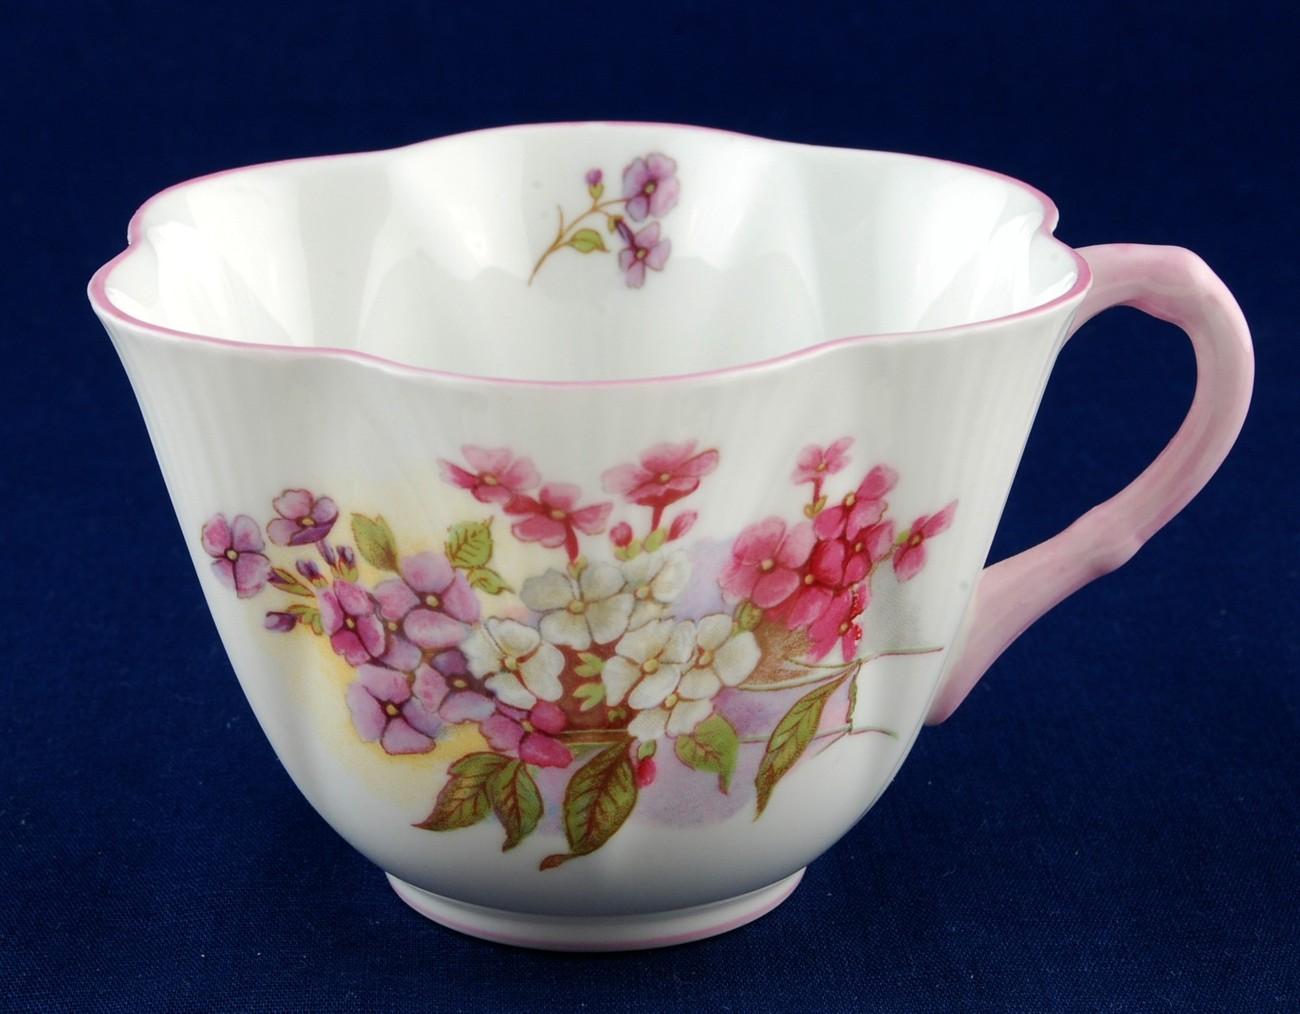 Shelley stocks cup dainty